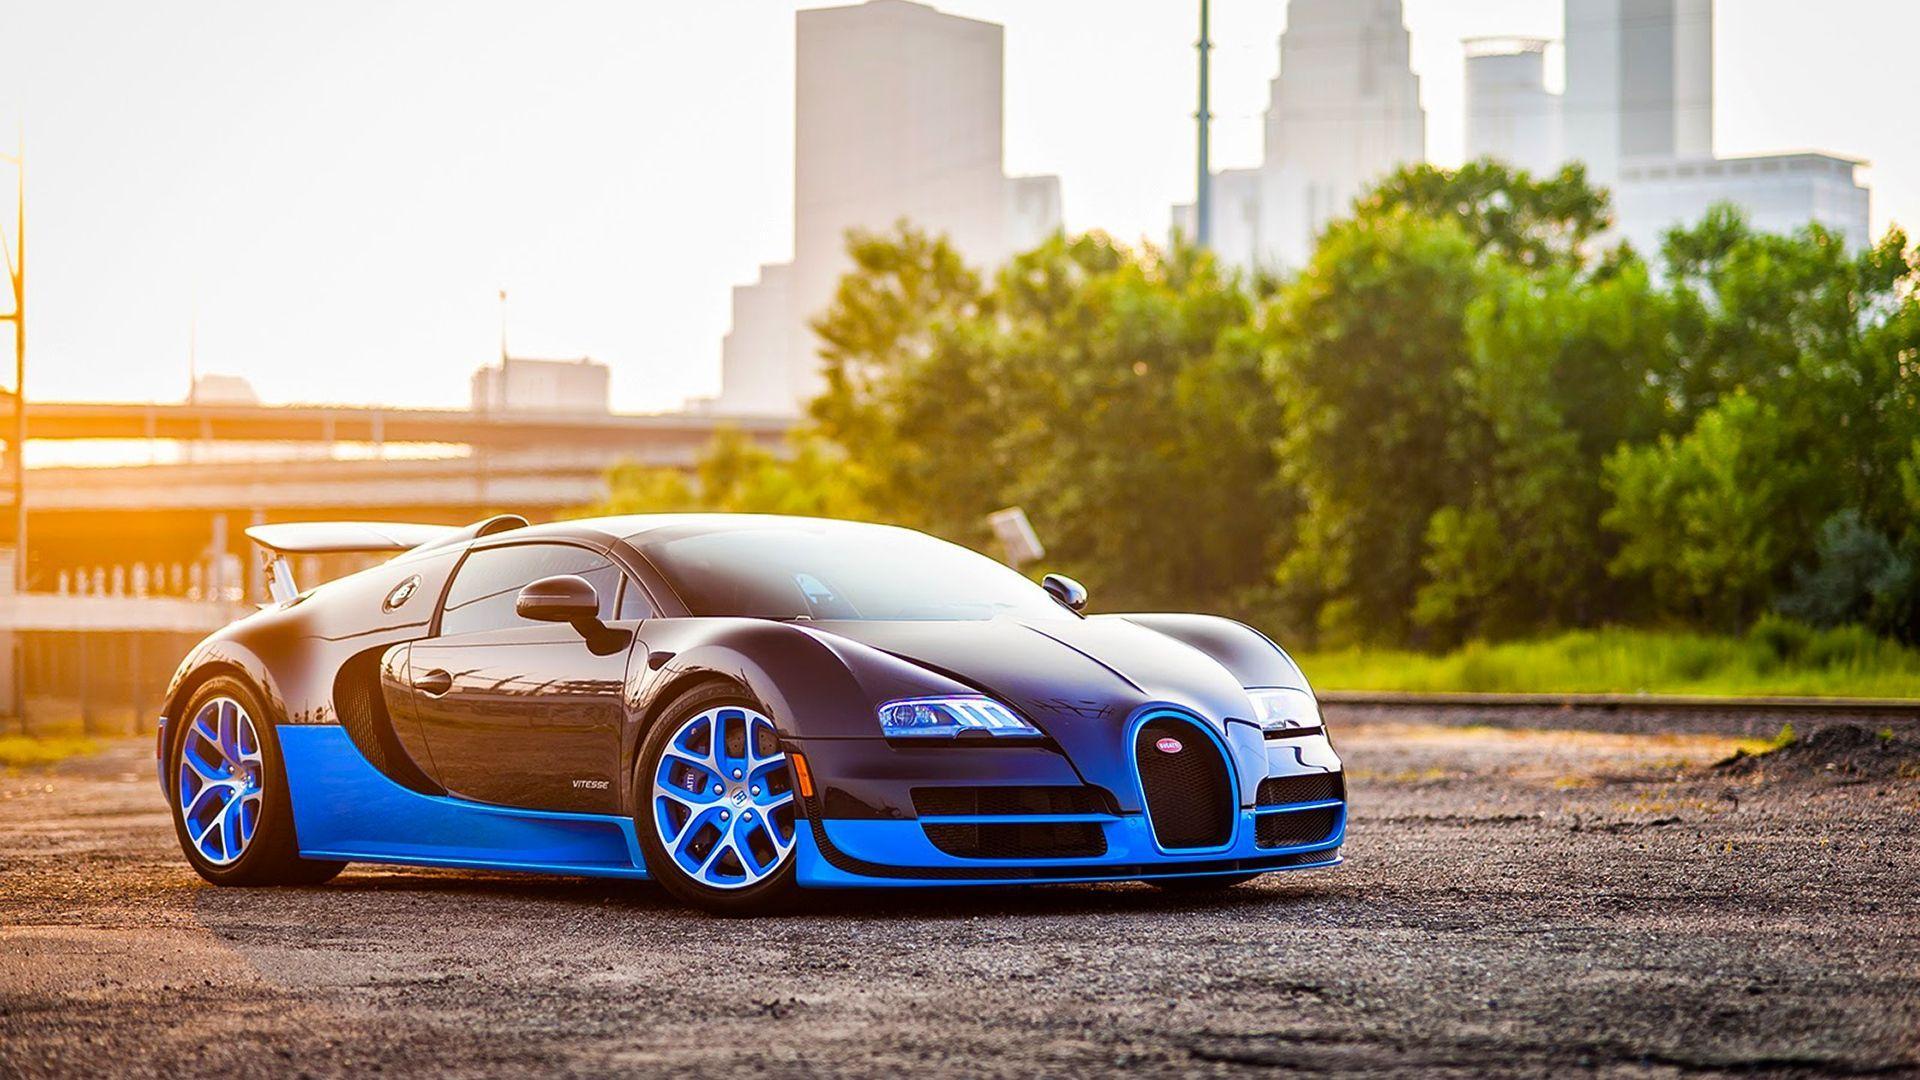 Blue Bugatti Veyron Wallpapers Top Free Blue Bugatti